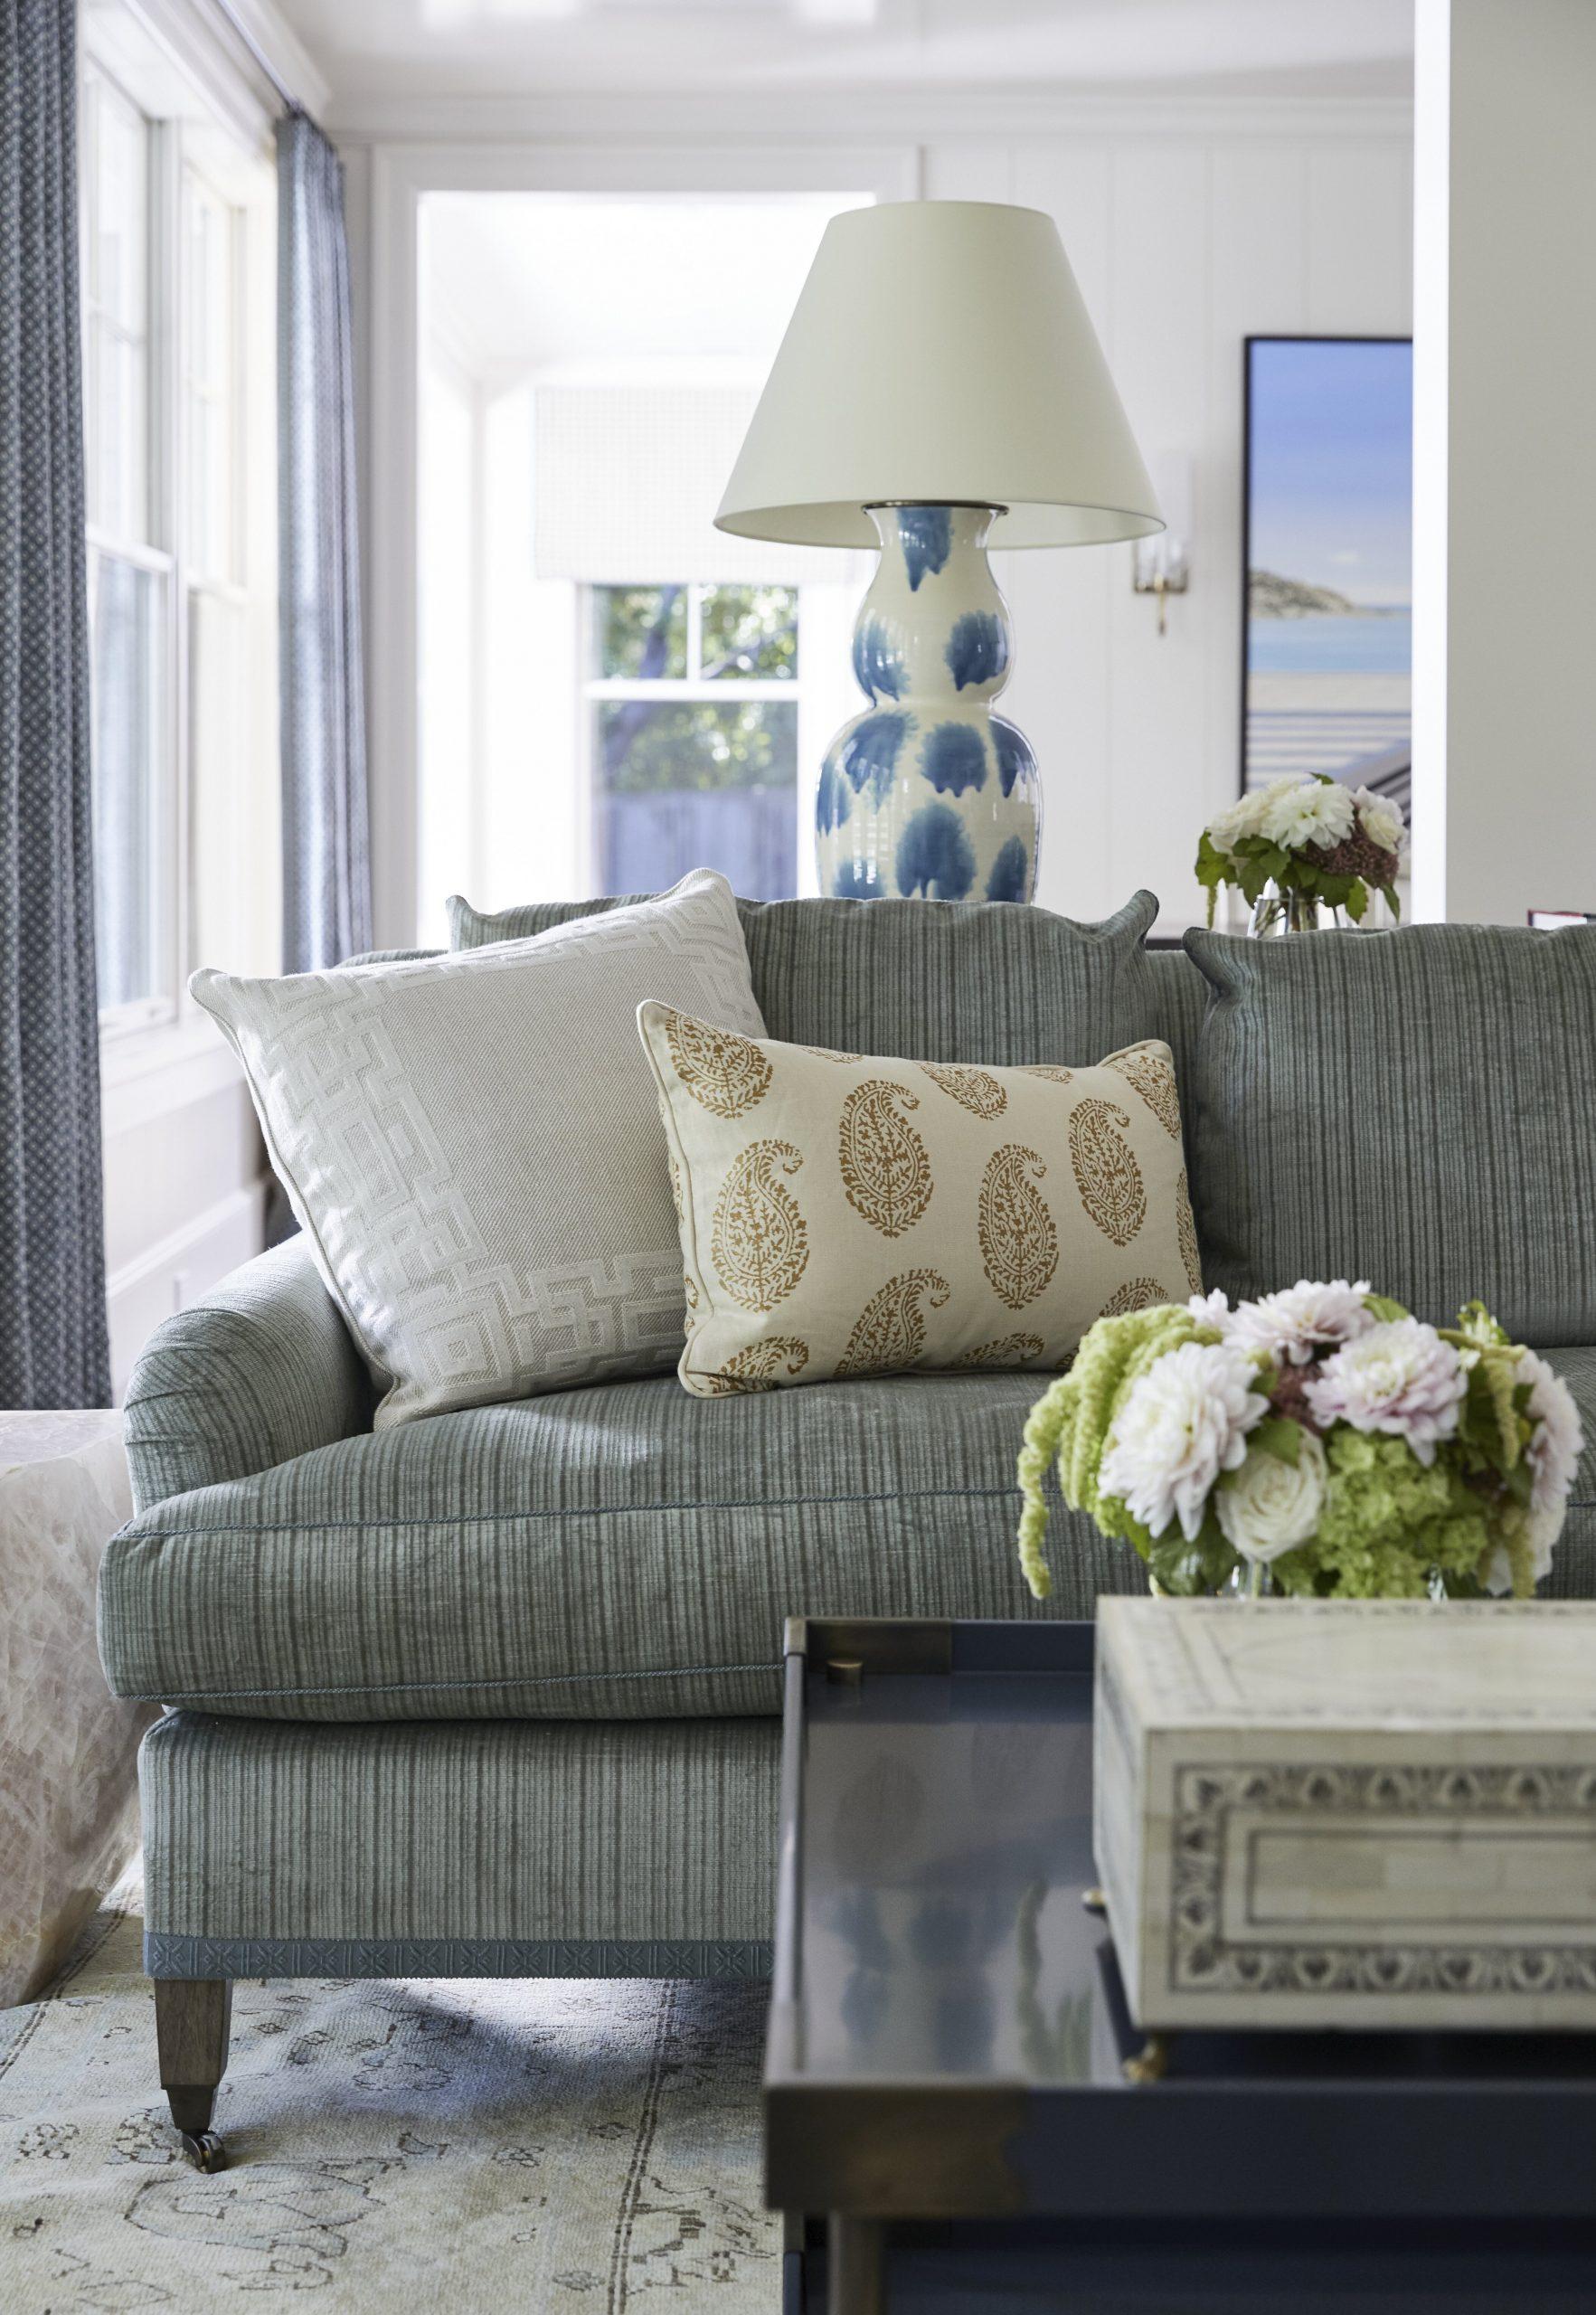 Vertical striped gray sofa